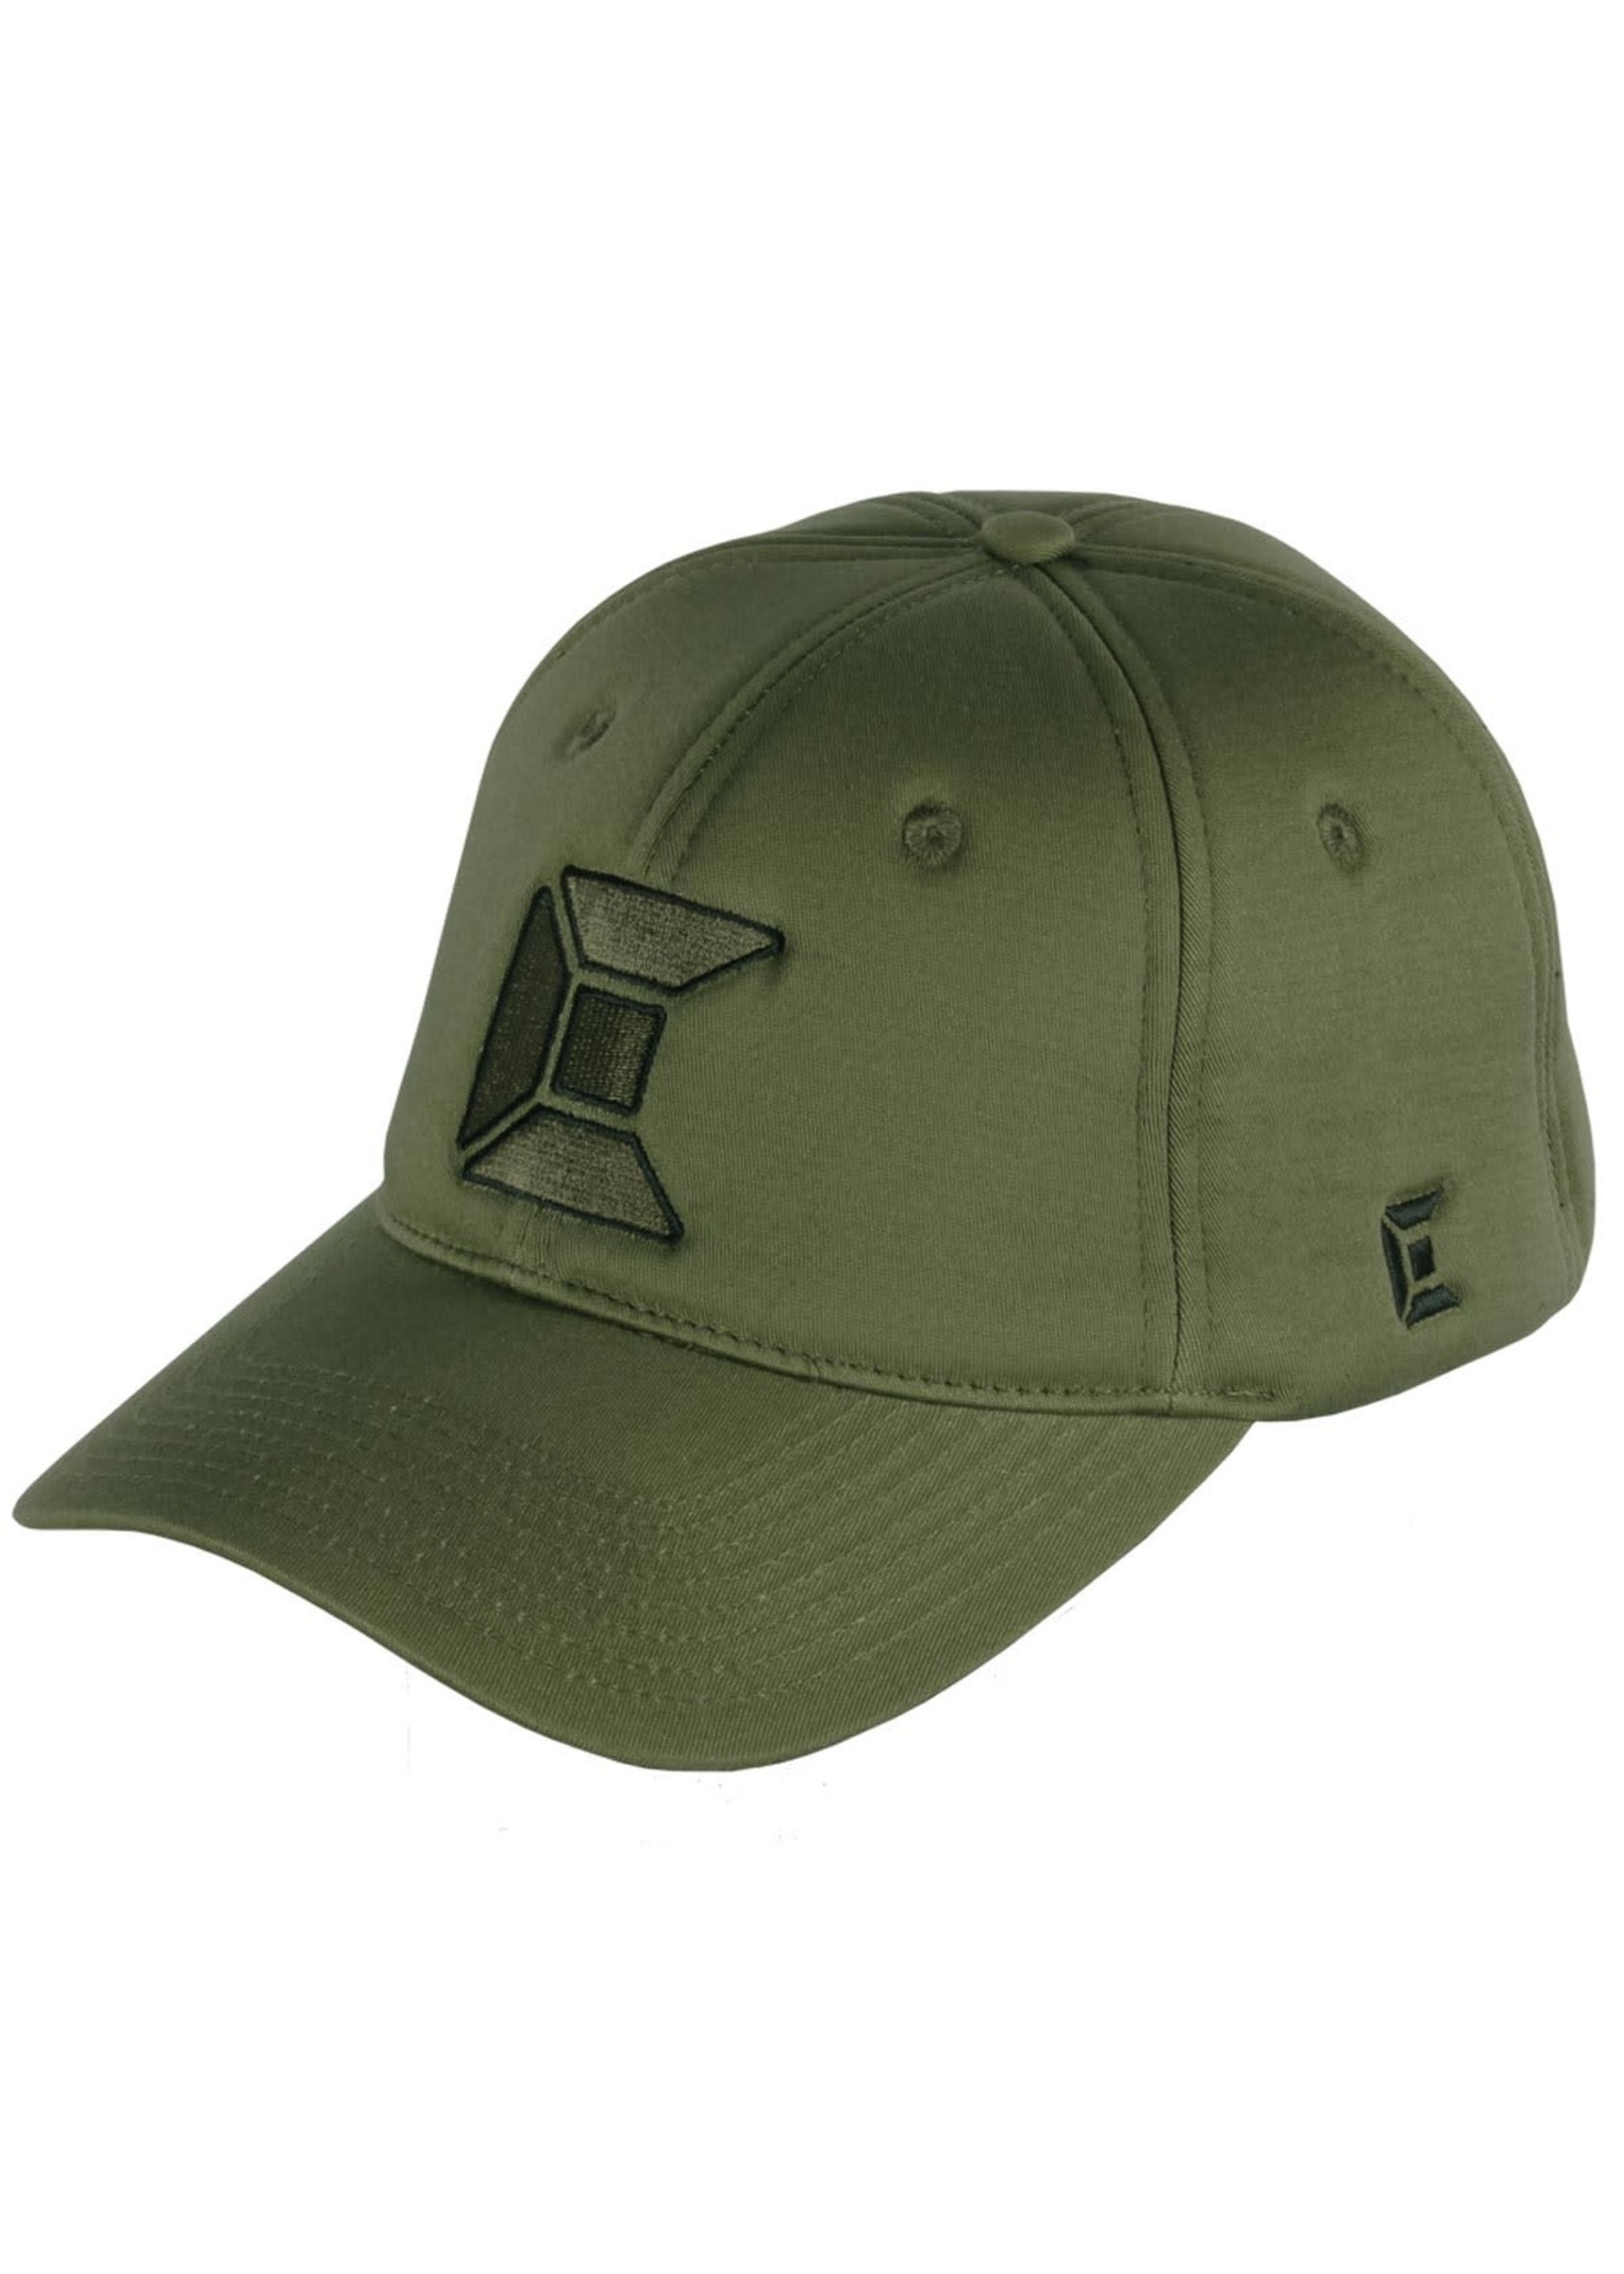 EXALT PAINTBALL BOUNCE HAT